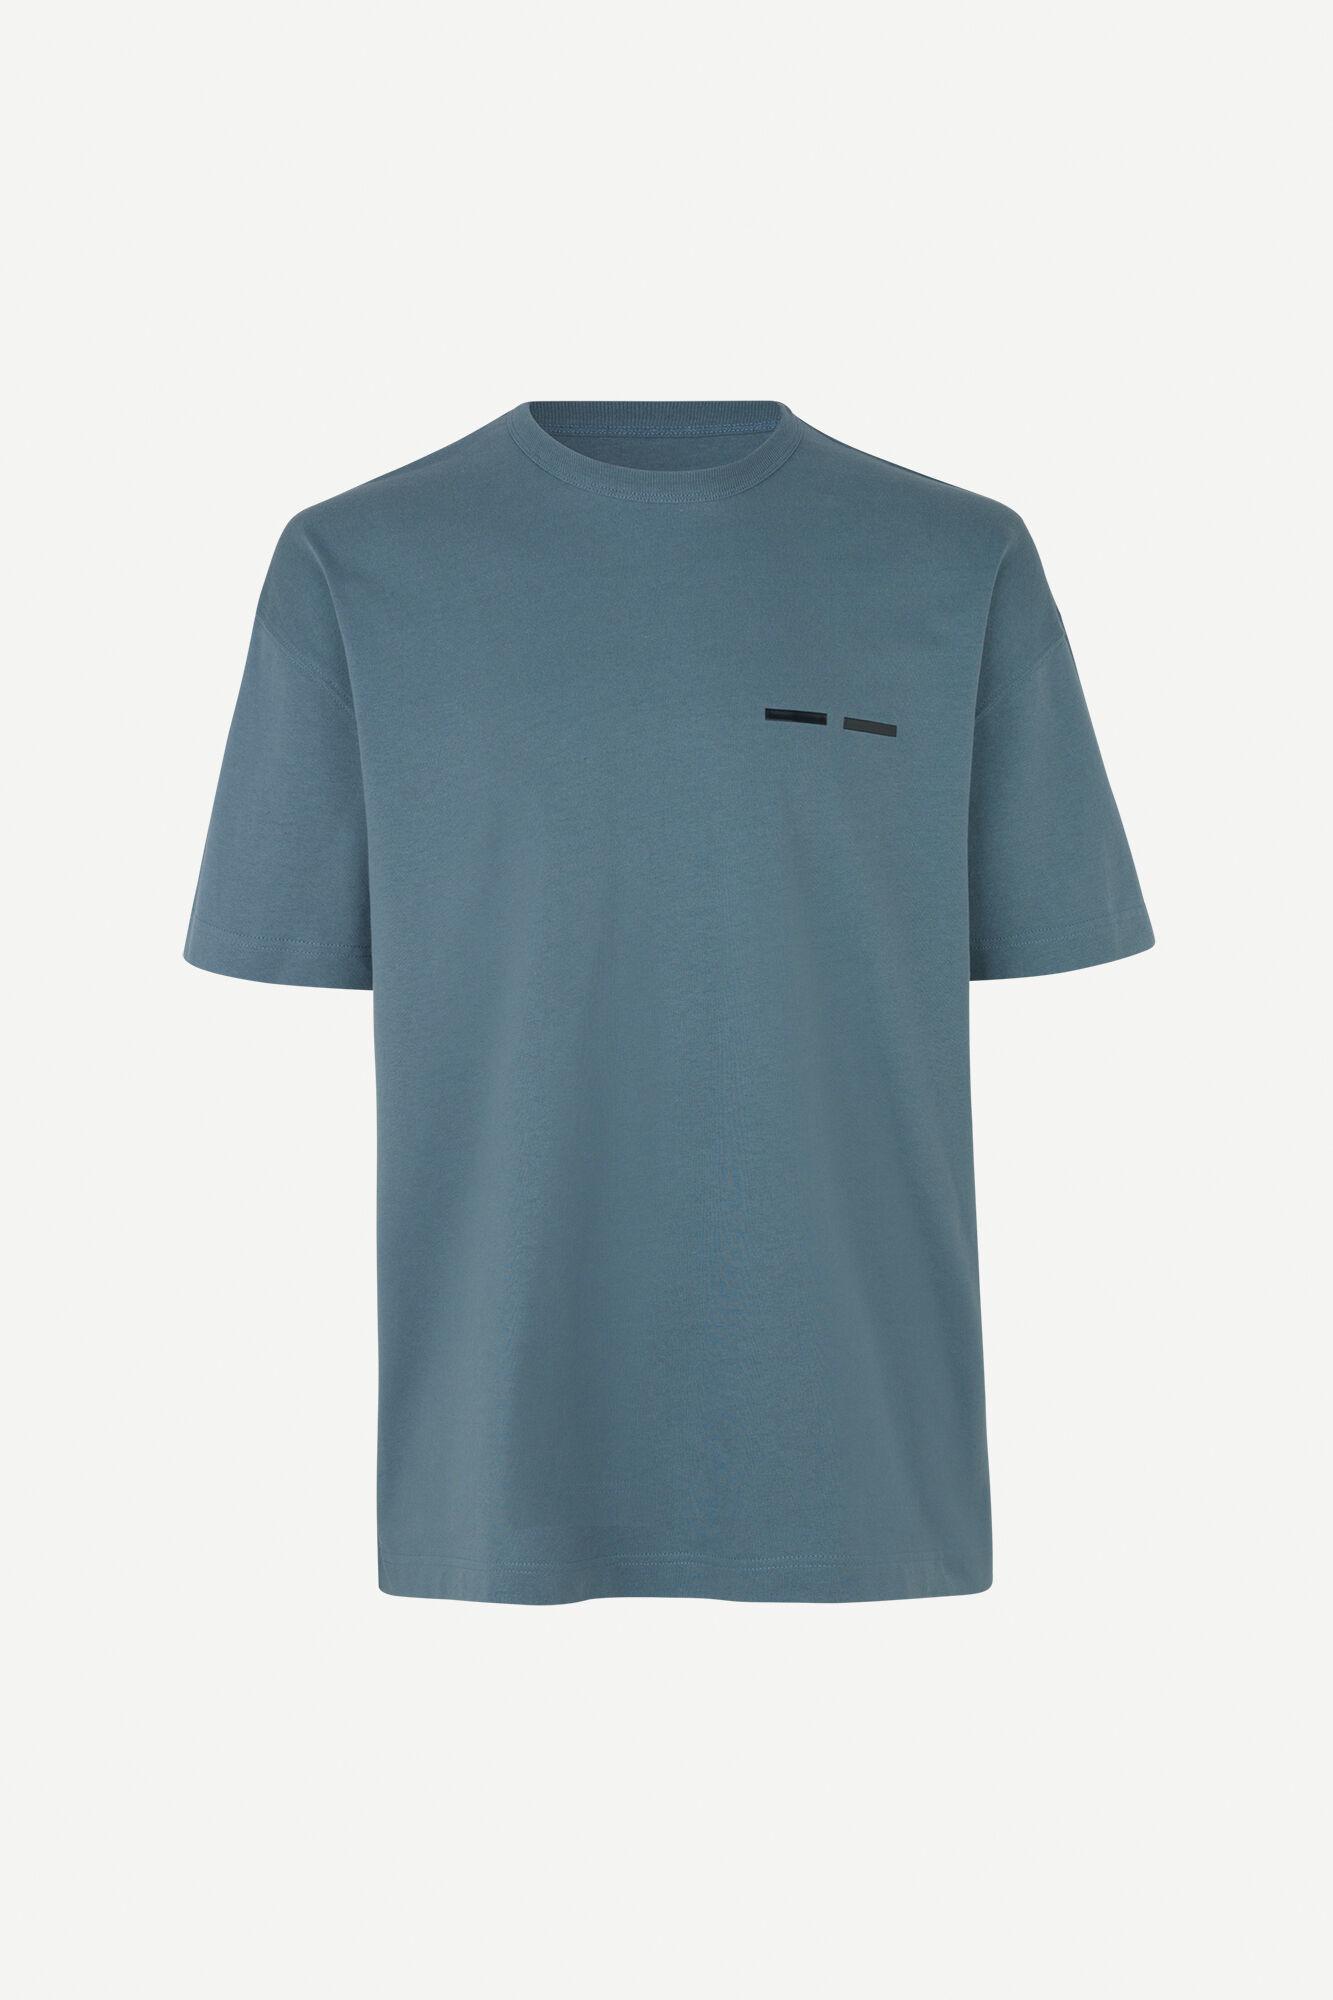 Toscan T-Shirt Blue Mirage-1